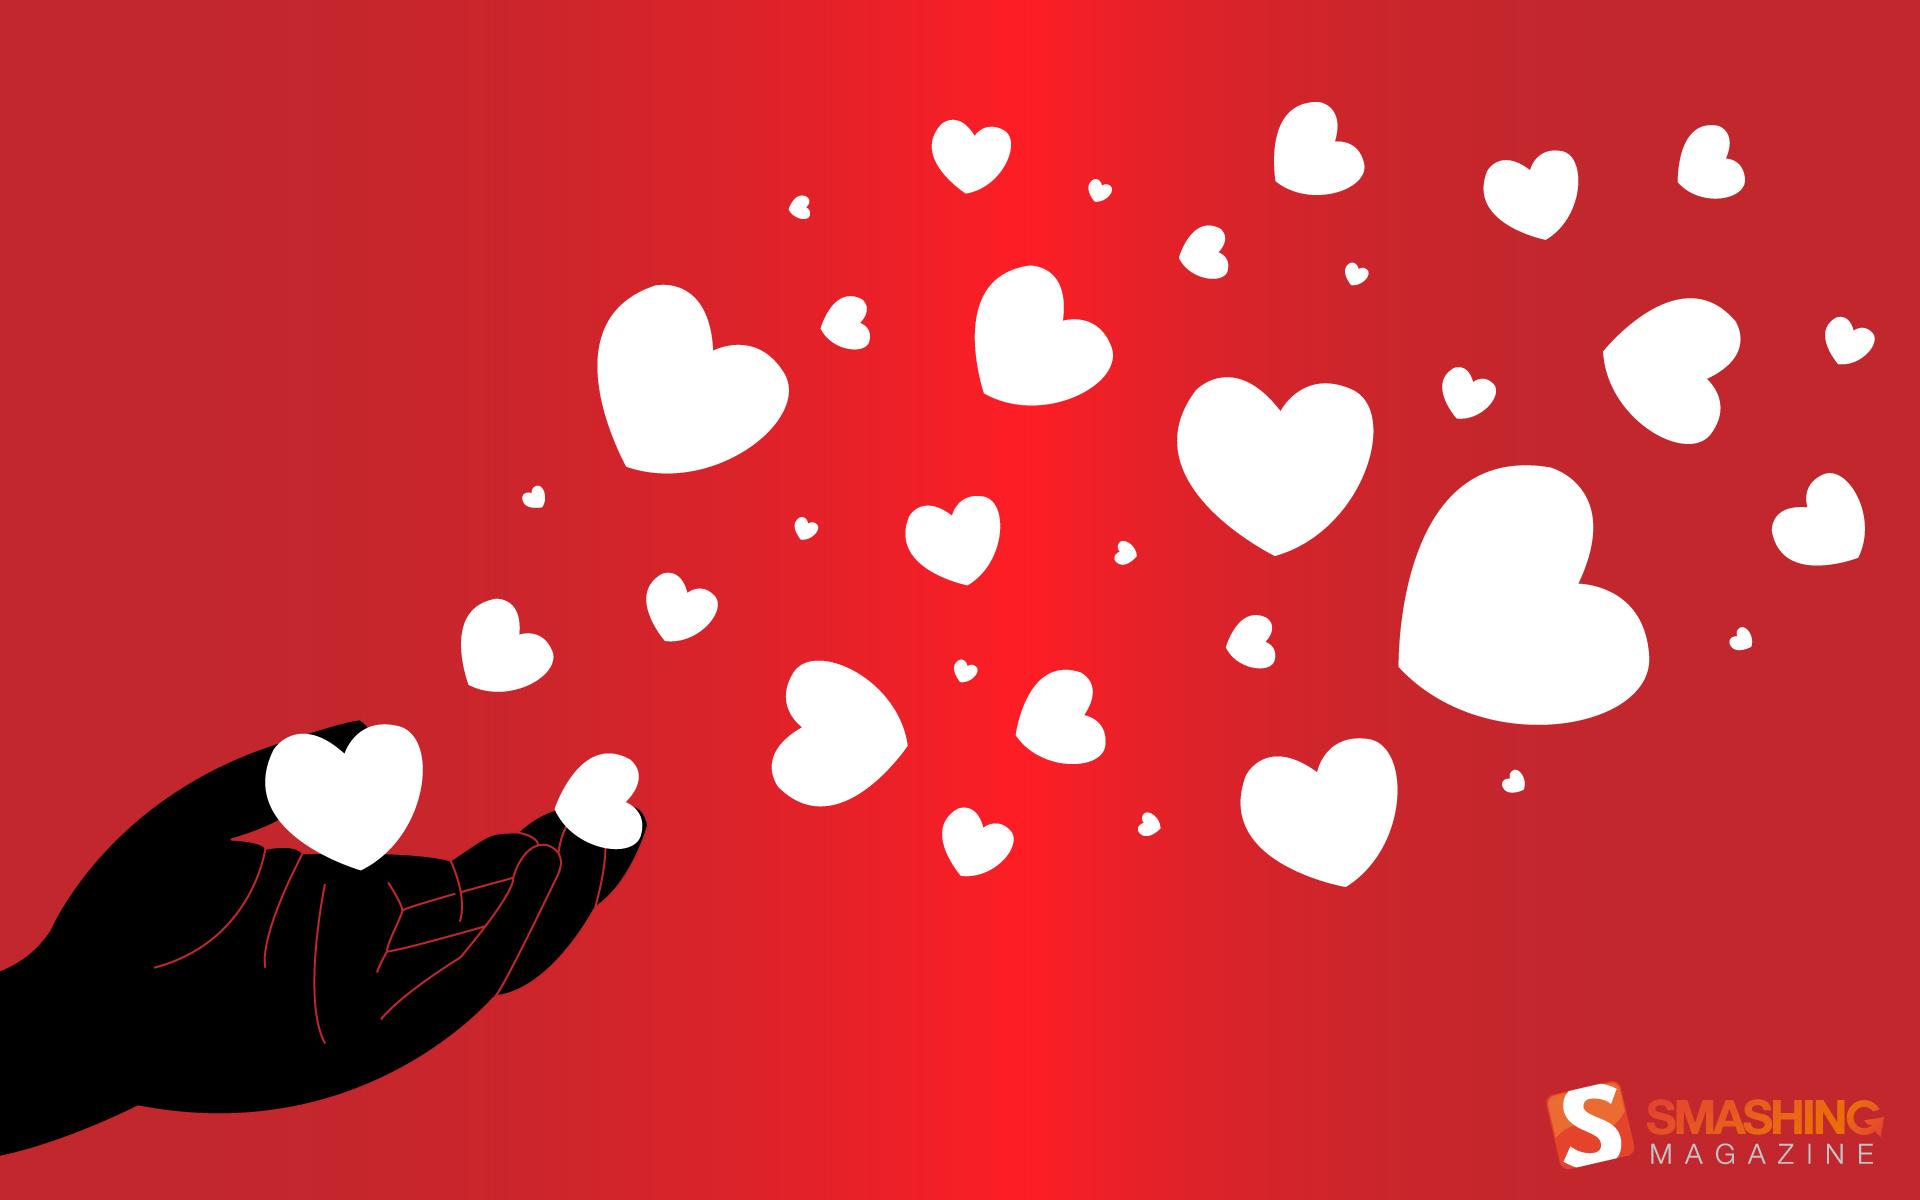 Love Wallpaper Valentines Day 257492 Hd Wallpaper